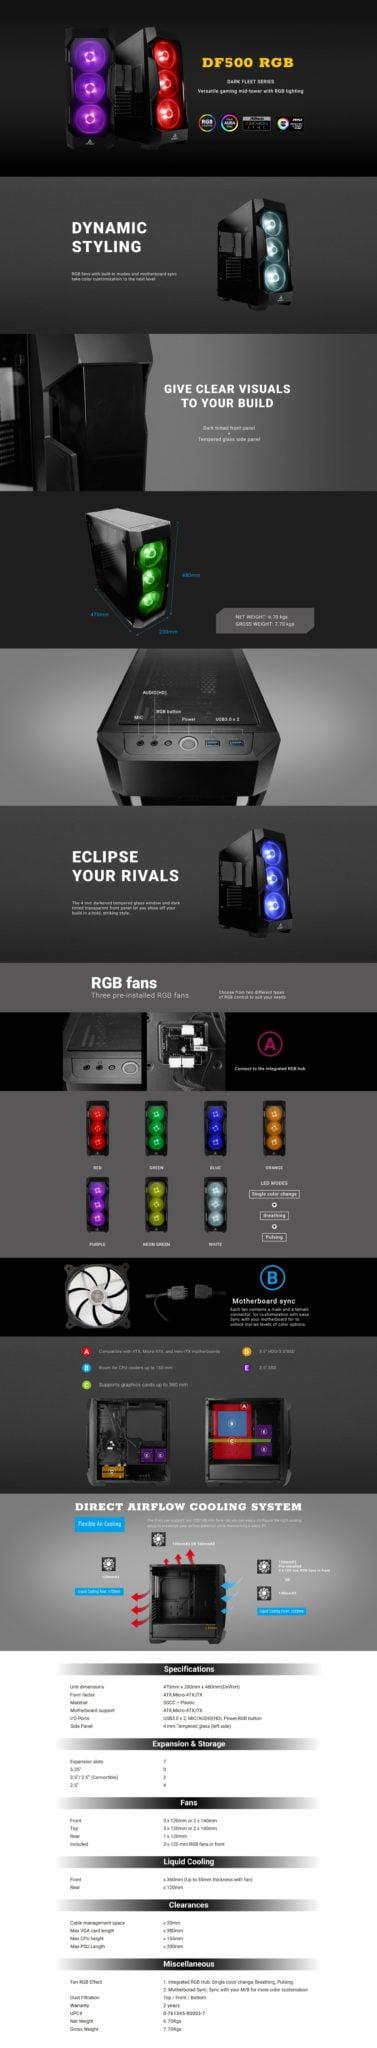 Antec DF 500 RGB Window (GPU 380mm) ATX| Micro ATX|ITX Gaming Chassis Black